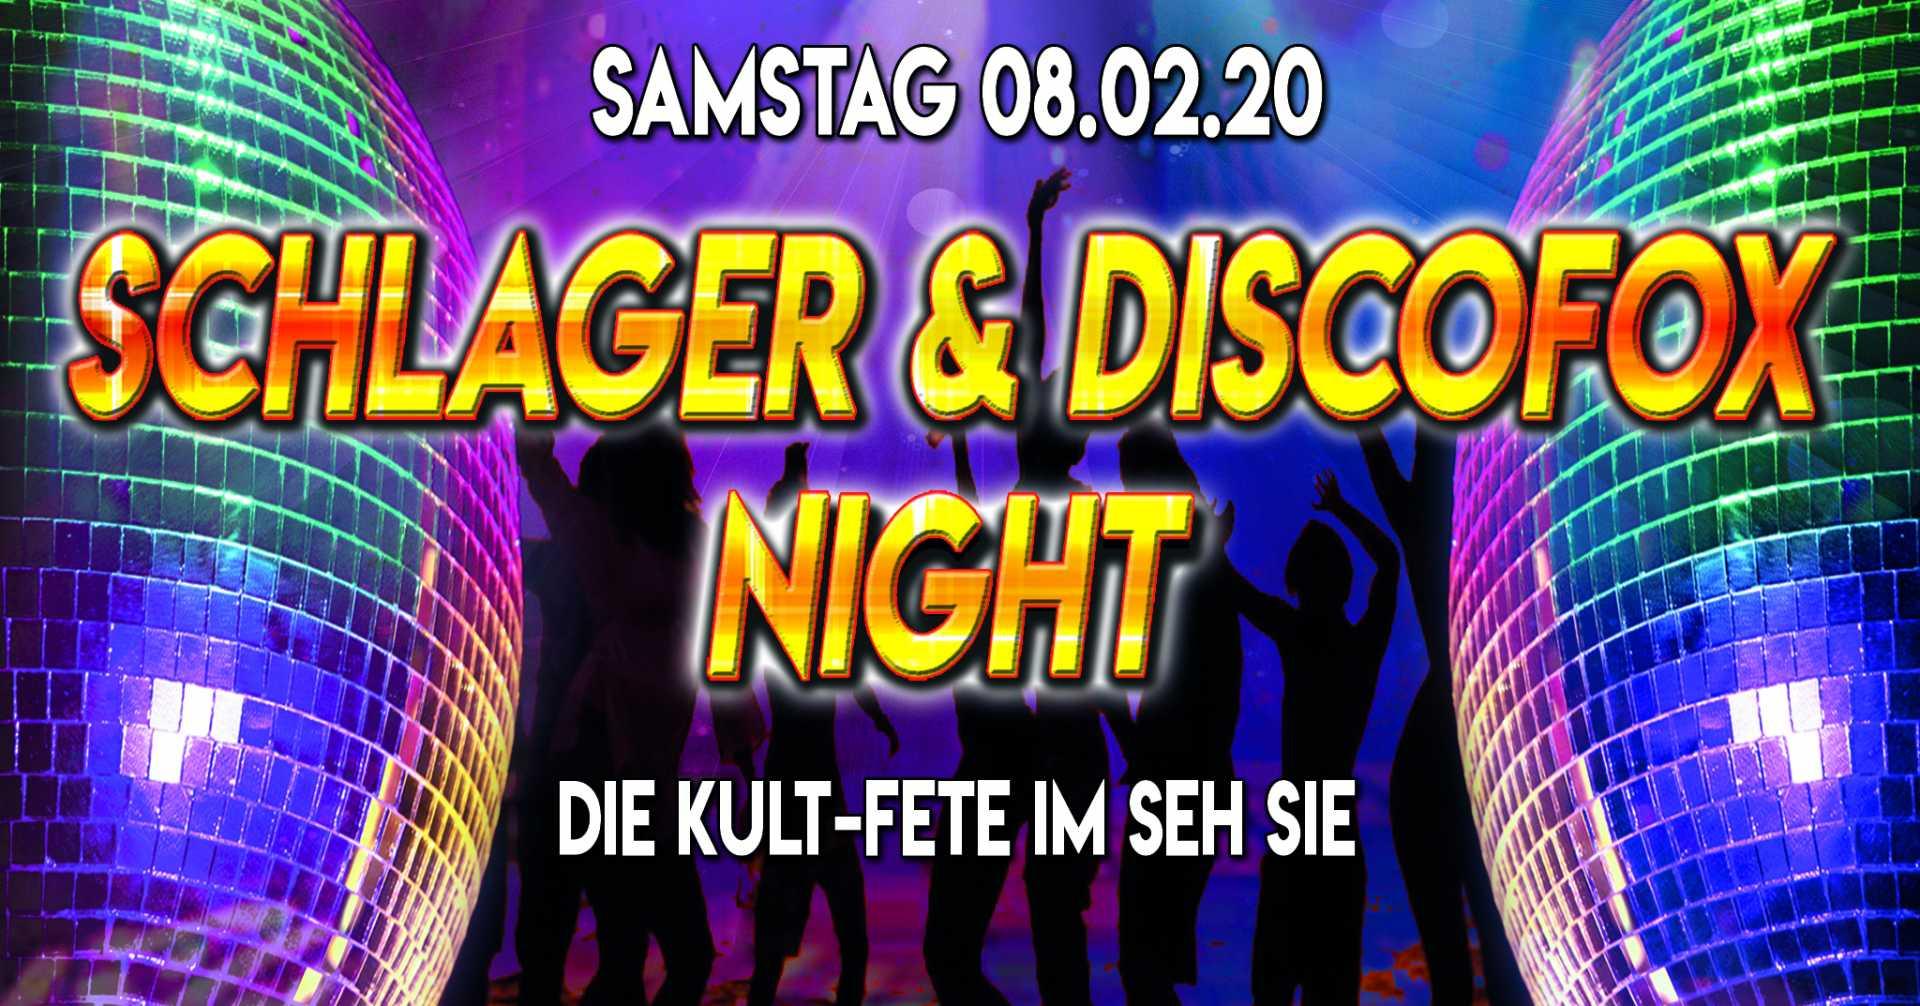 08.02.2020 Schlager & Discofox Night